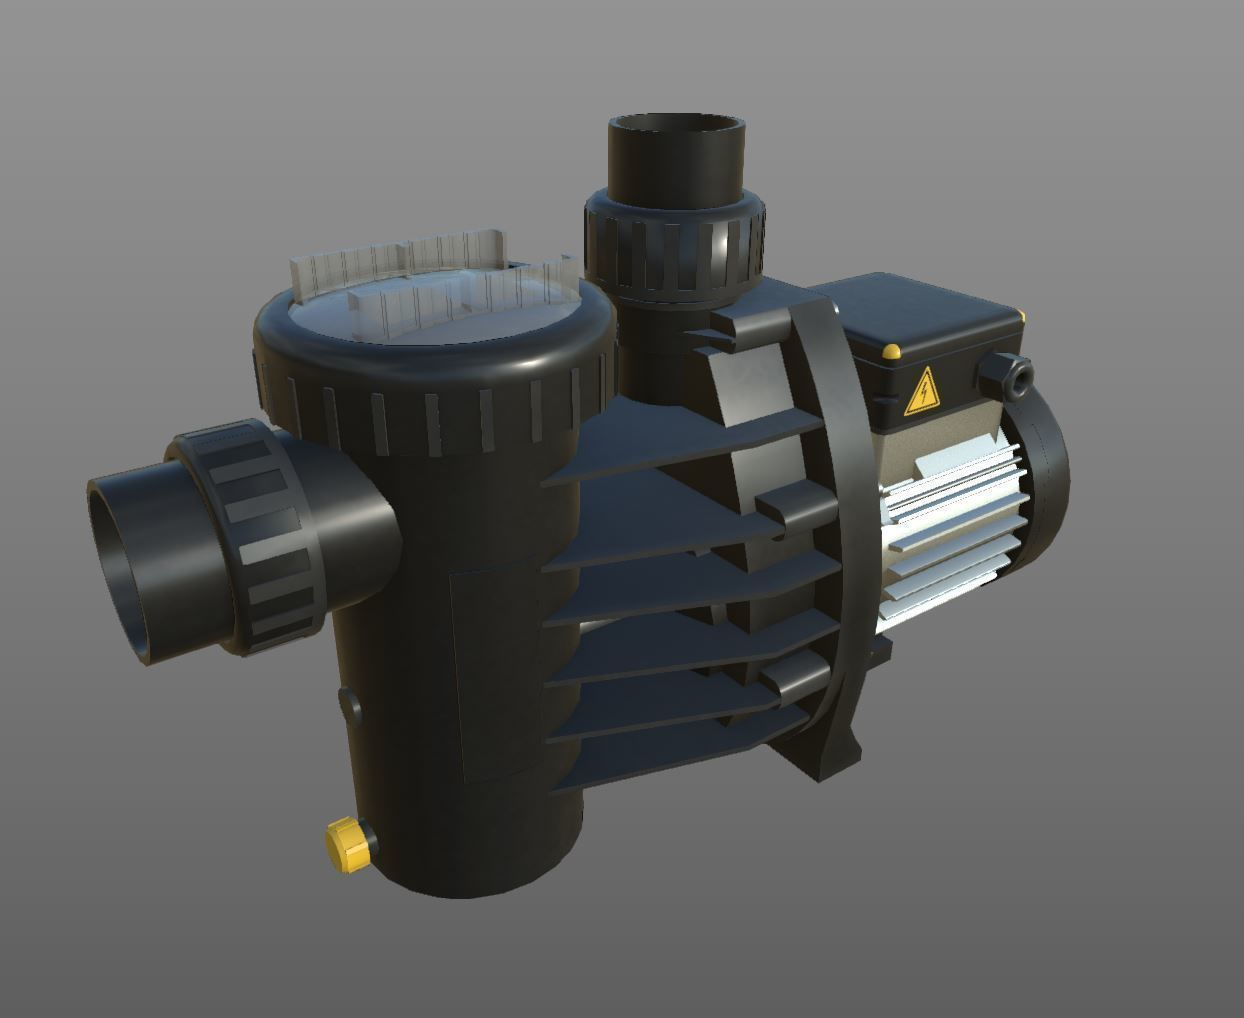 Speck Badu Magic Filter Pump